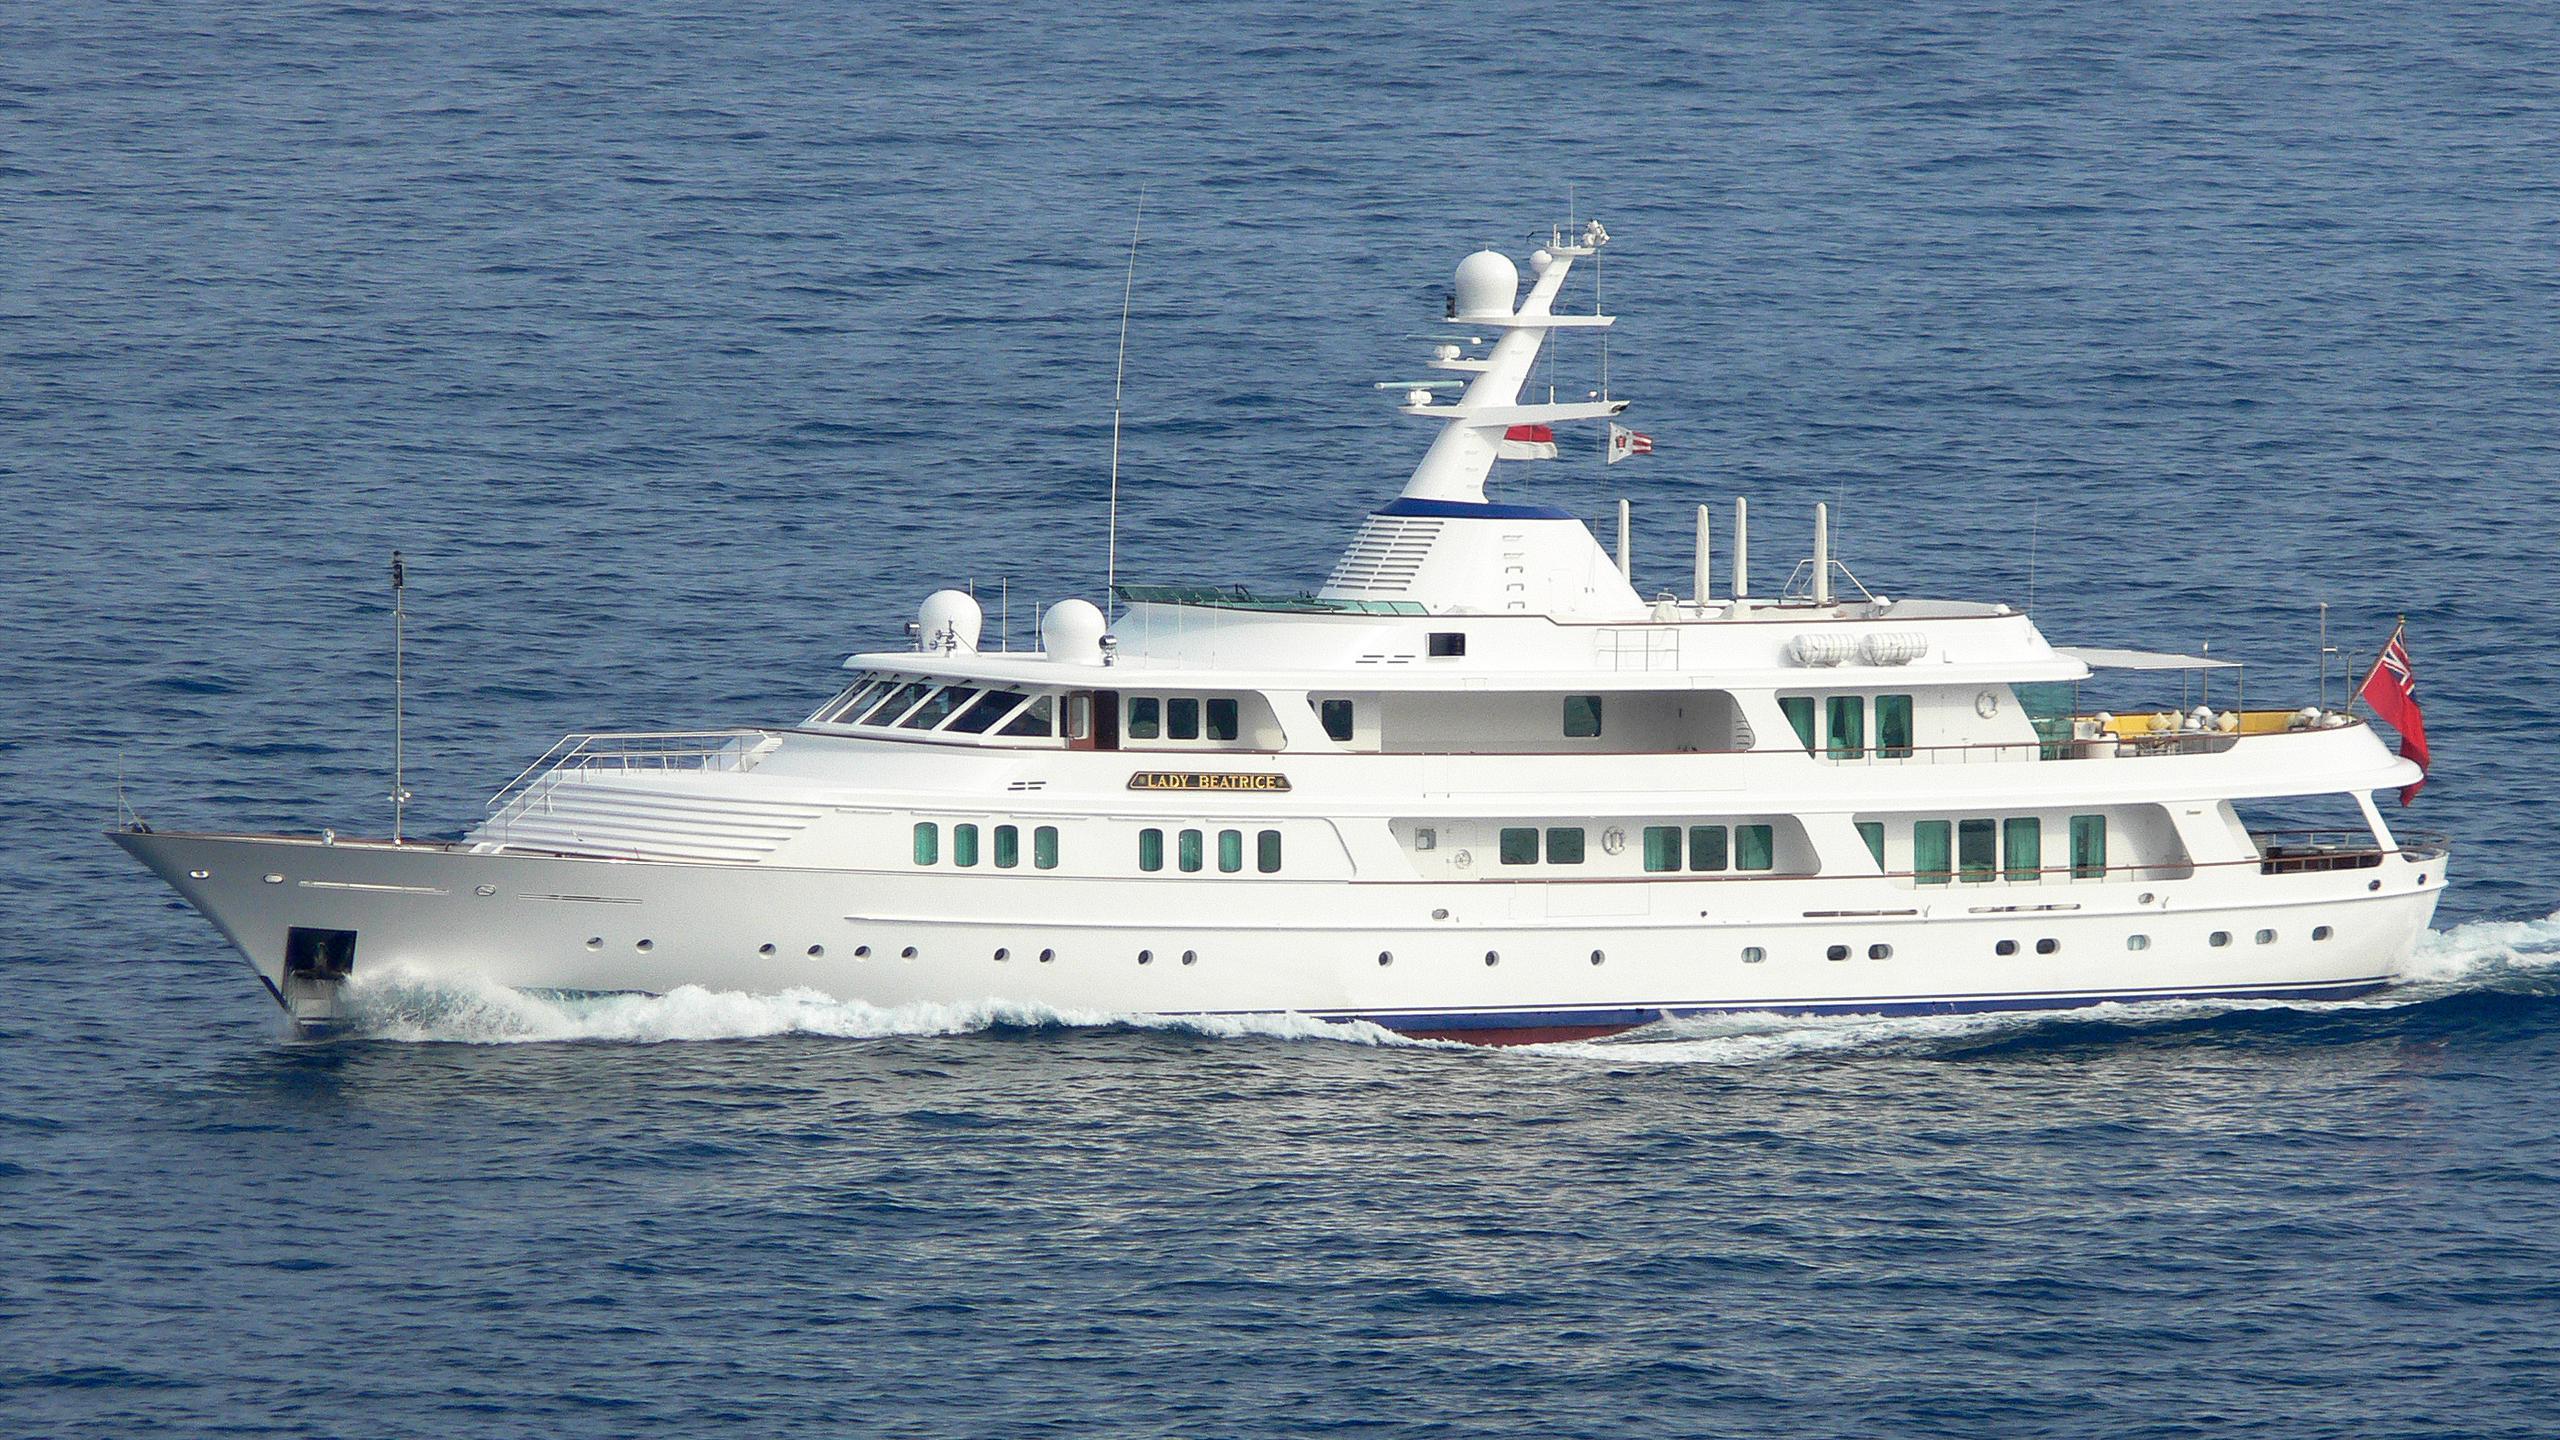 lady-beatrice-motor-yacht-feadship-1993-60m-cruising-profile